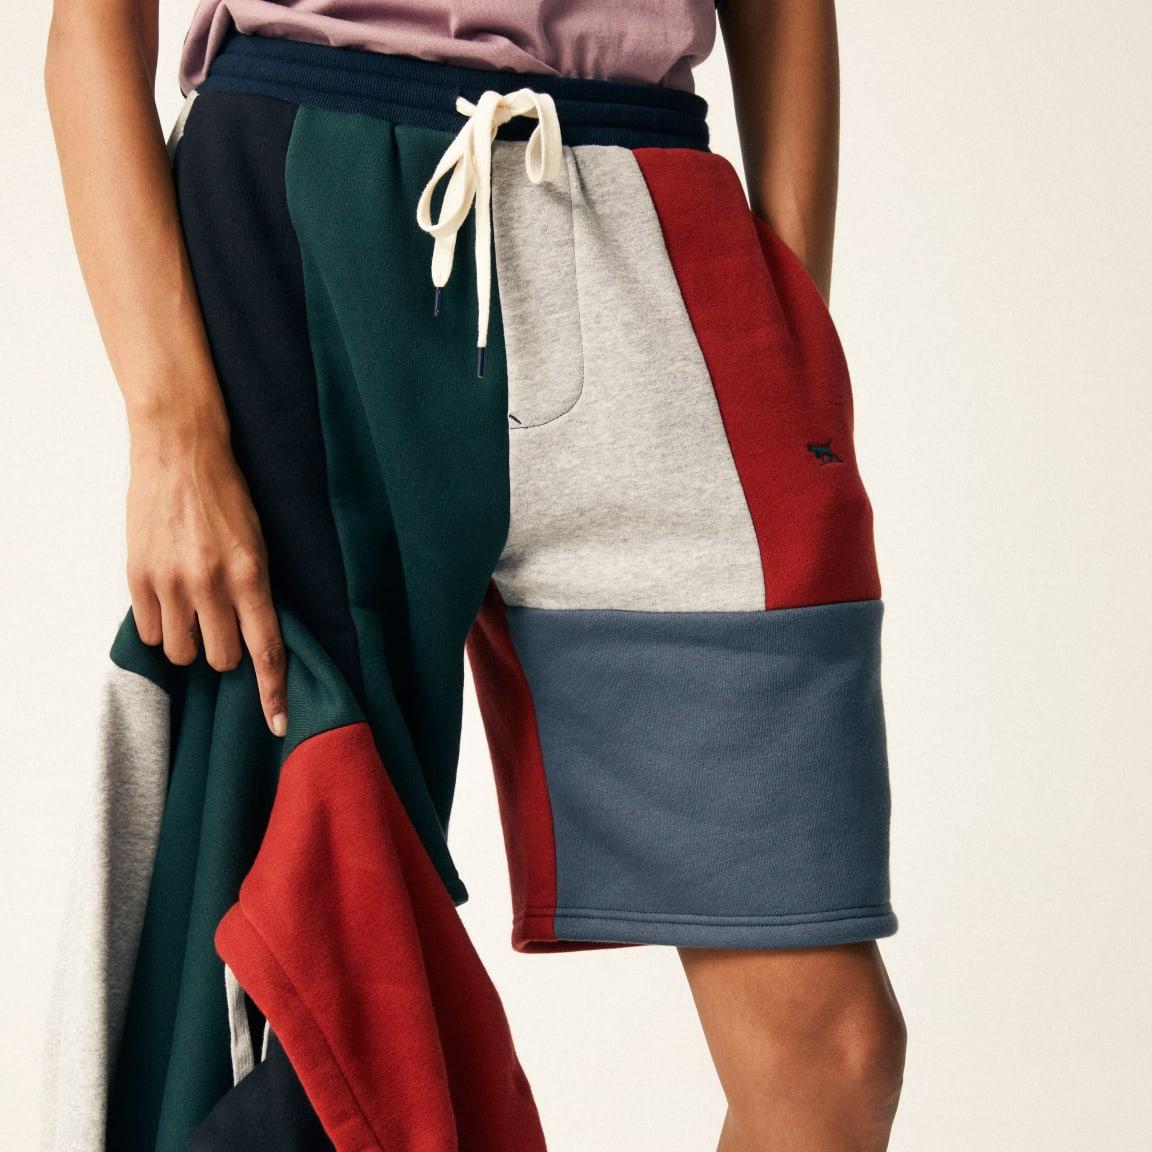 Rodd & Gunn: Heritage stitched into every garment